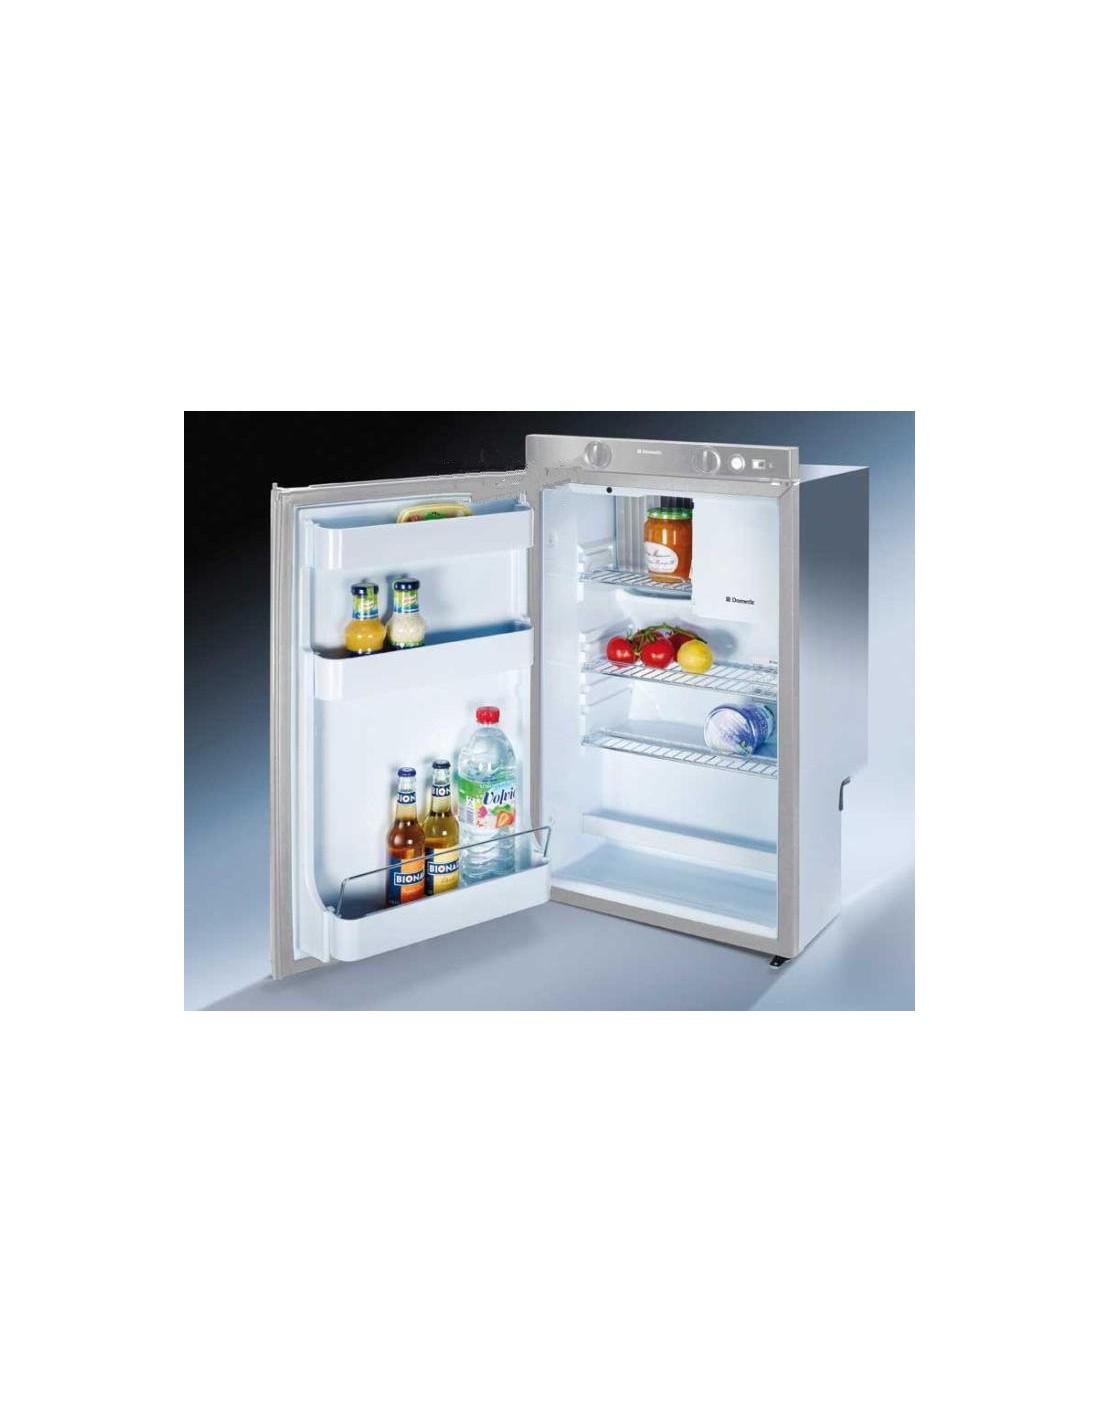 Dometic RM 5330 Absorber-kühlschrank 70l - Jundi Camping